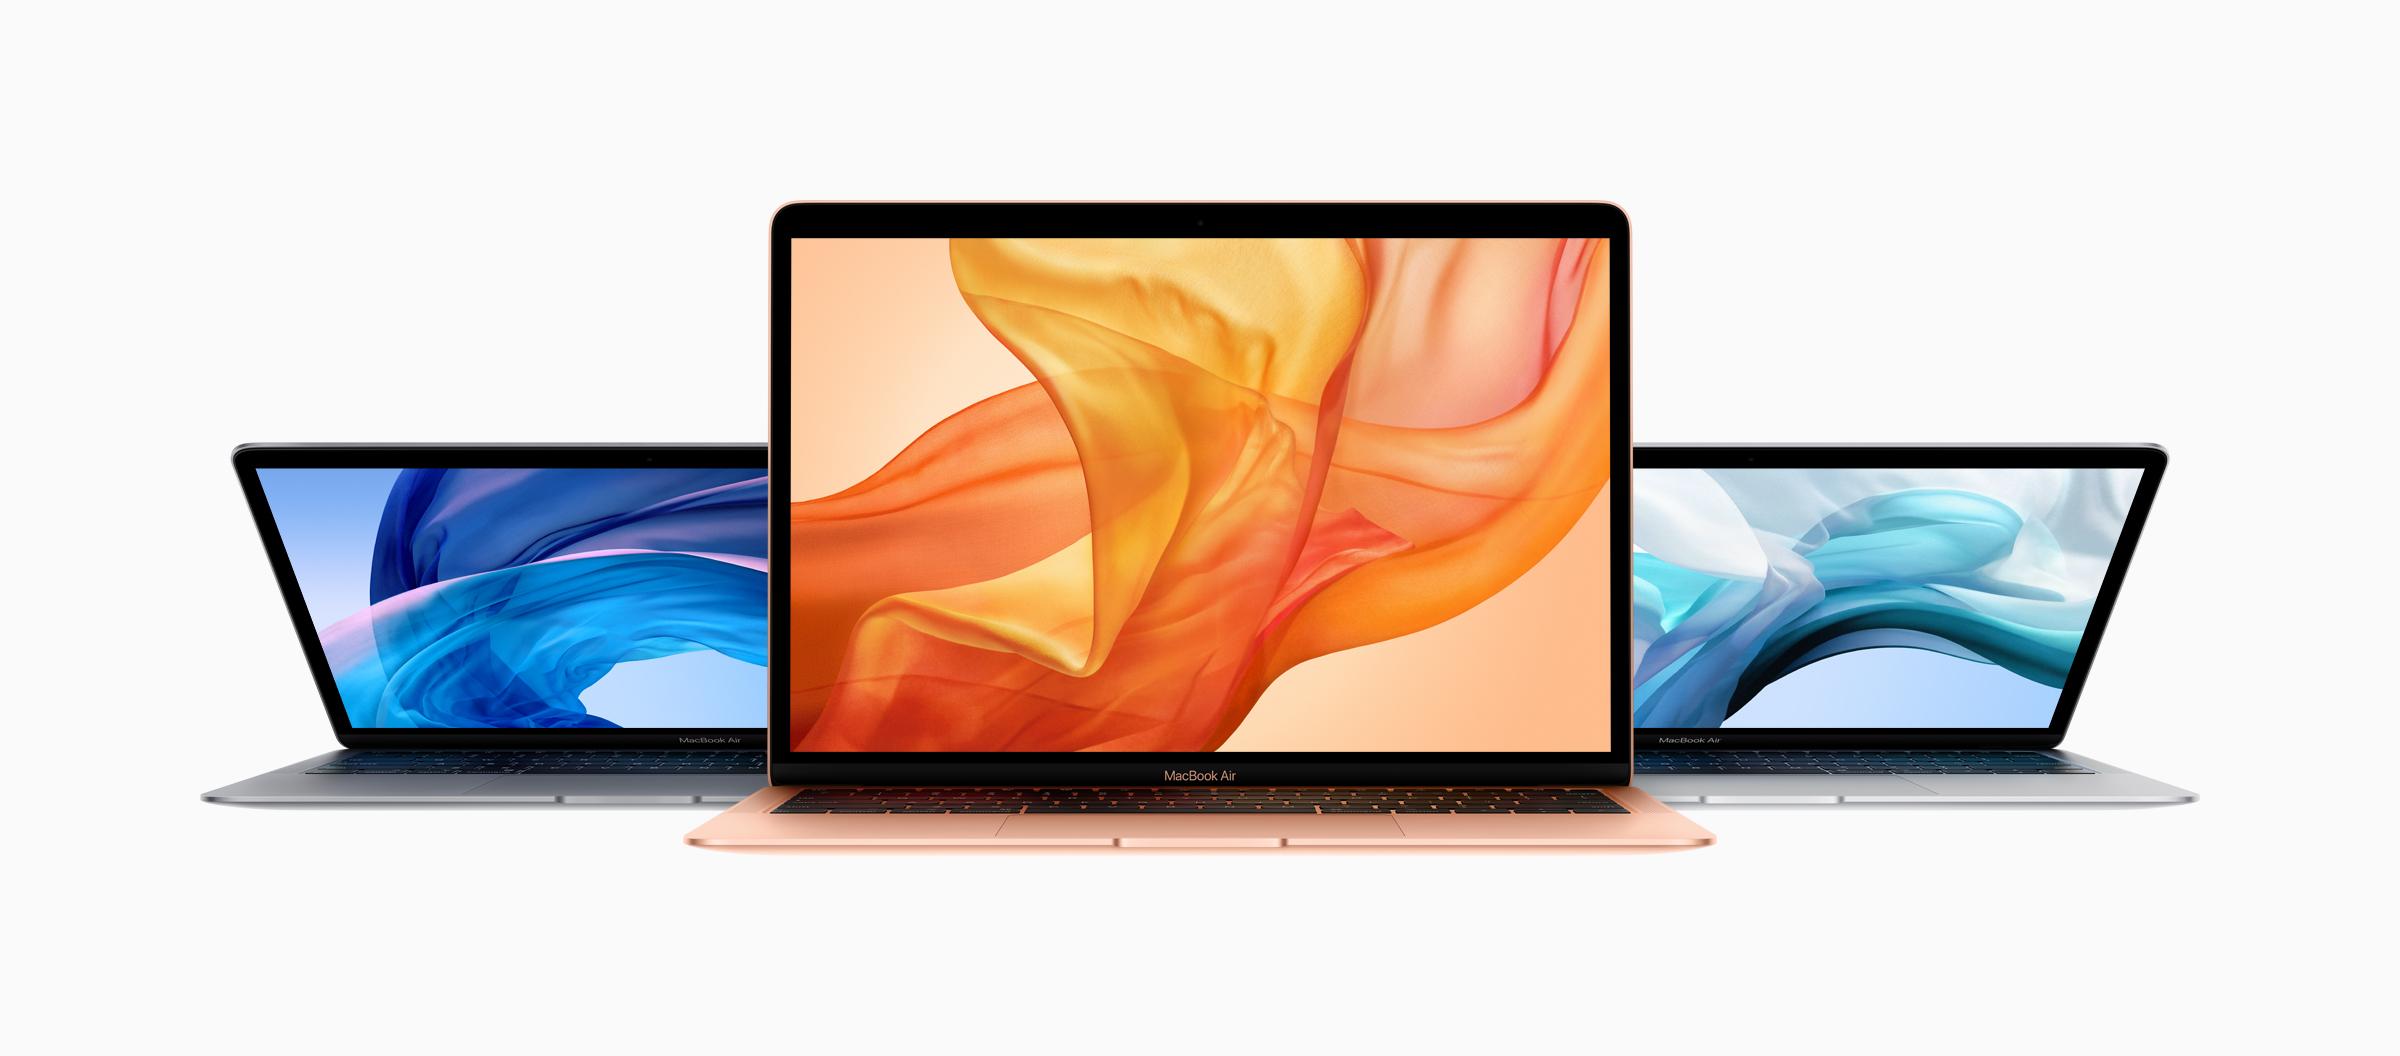 Tři nové barevné varianty MacBooku Air s Retina displejem